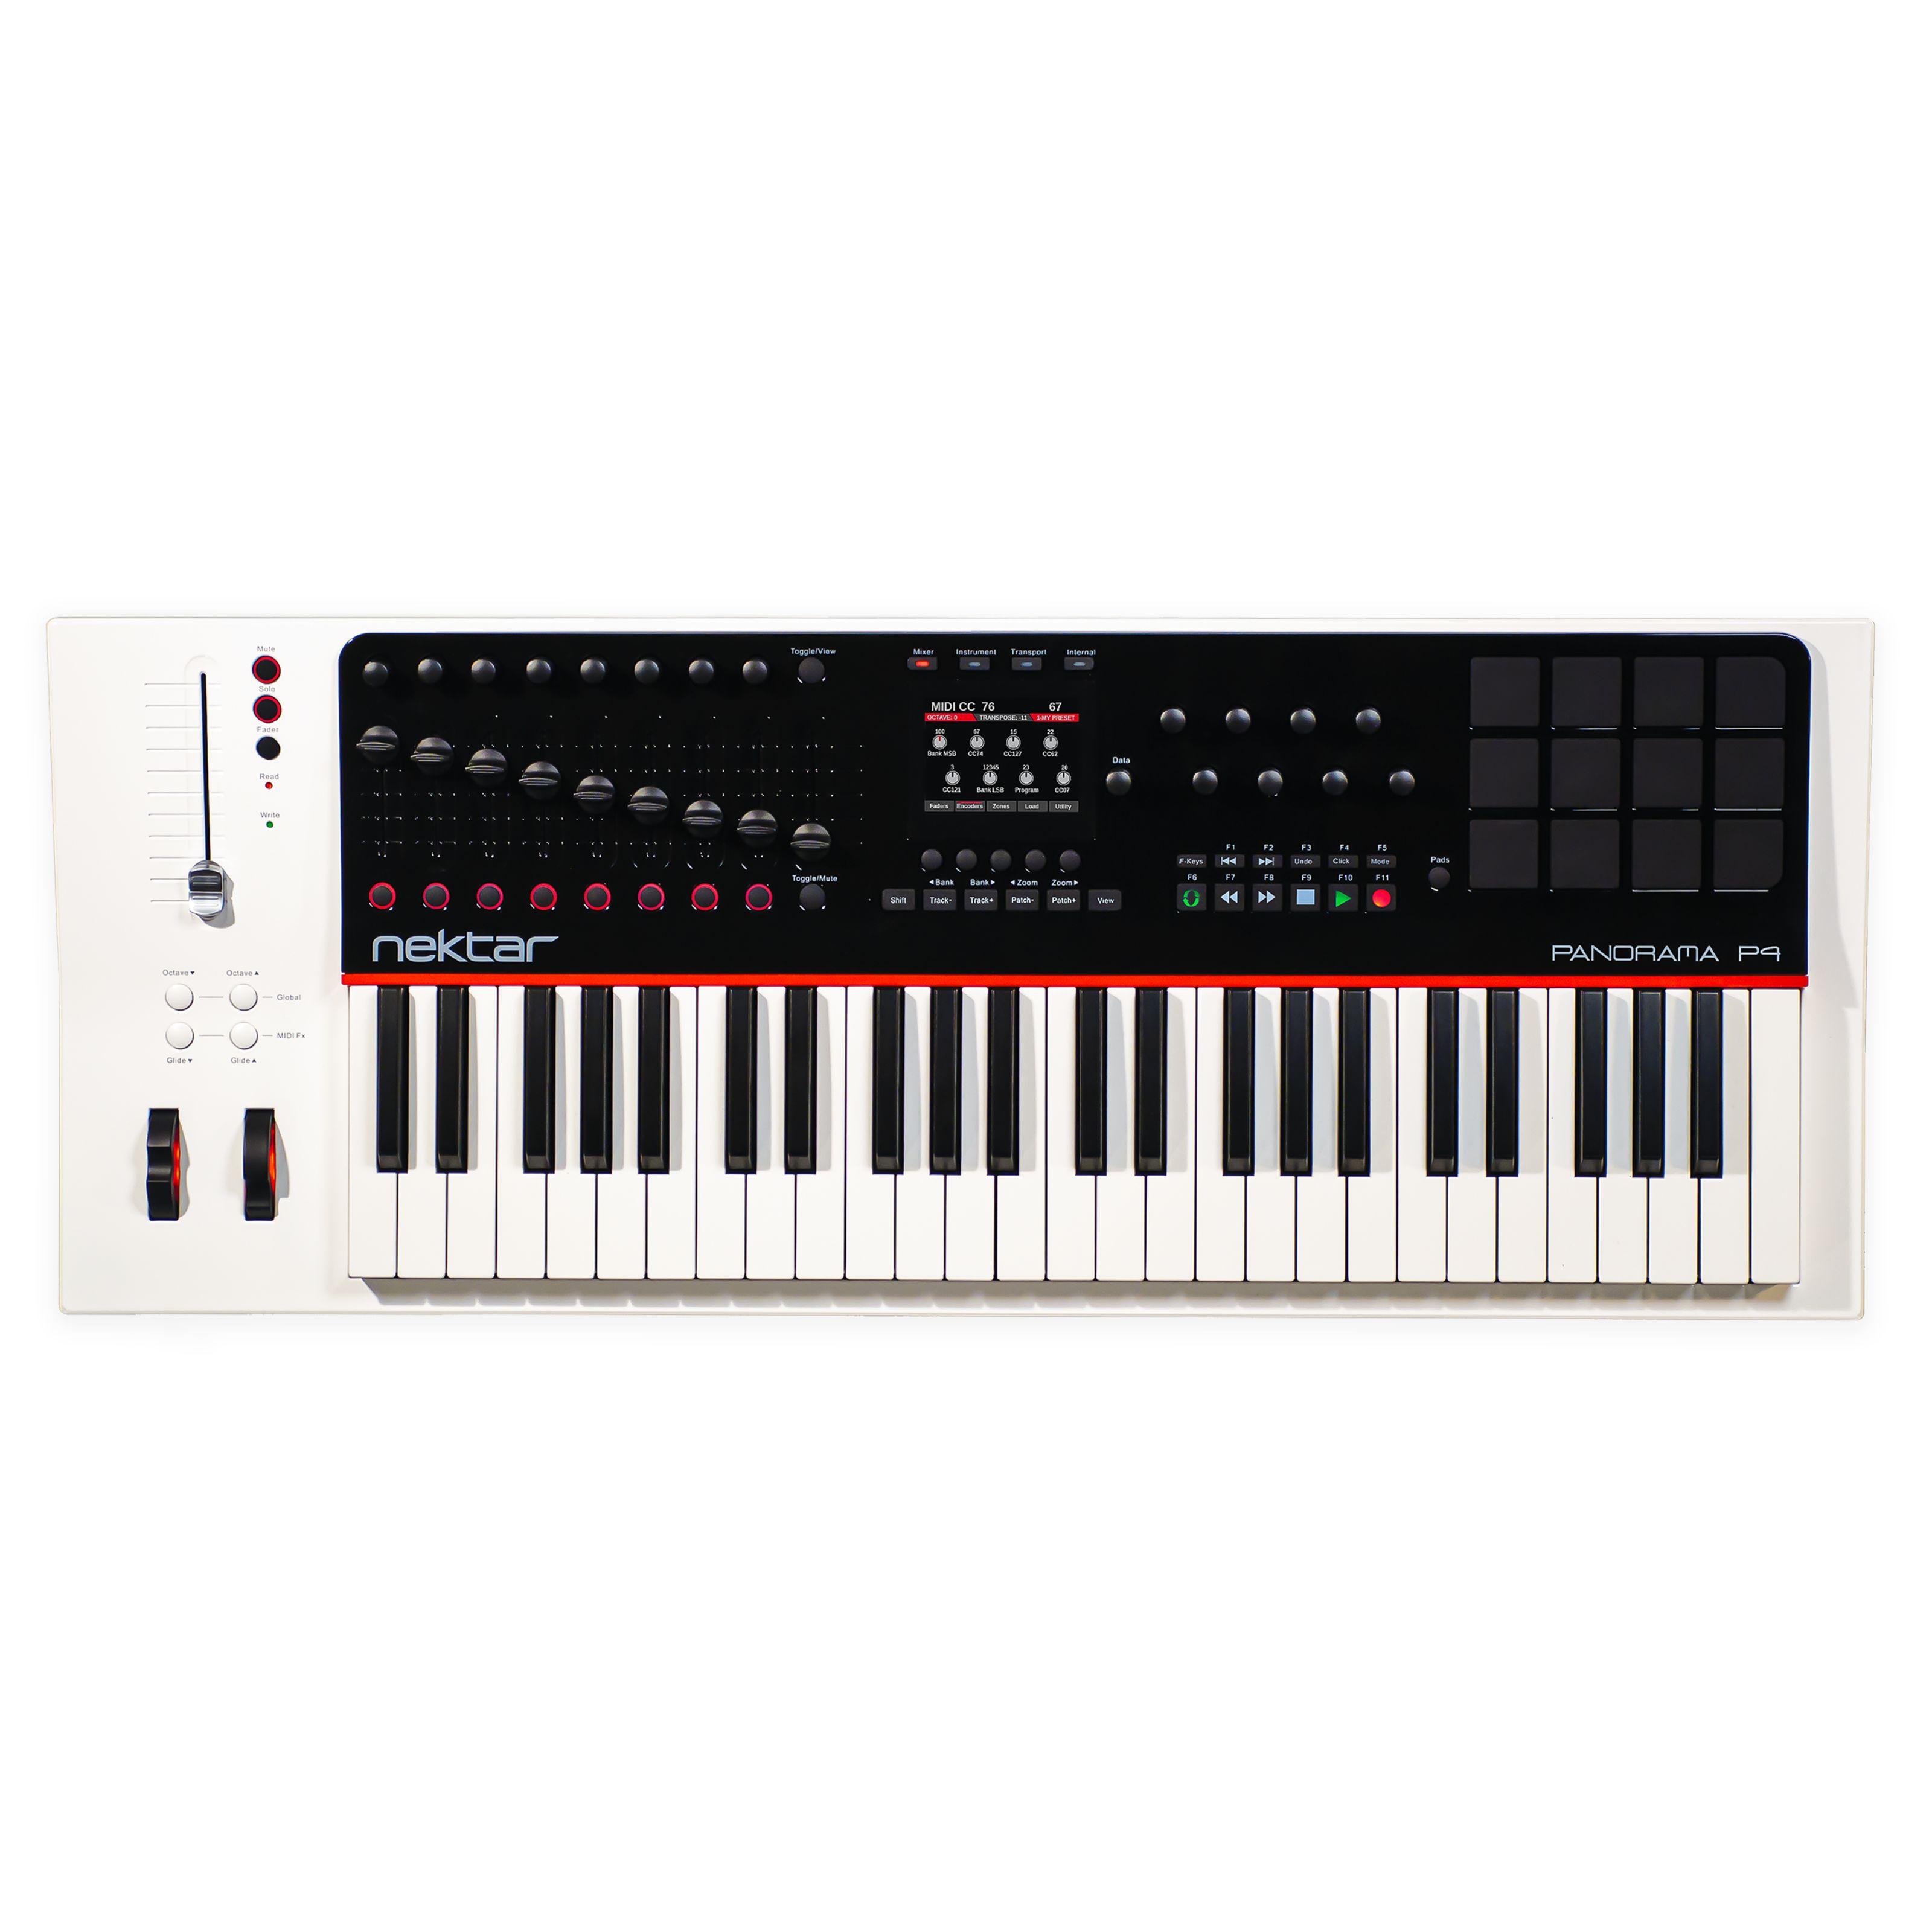 Nektar - Panorama P4 USB Controller Keyboard